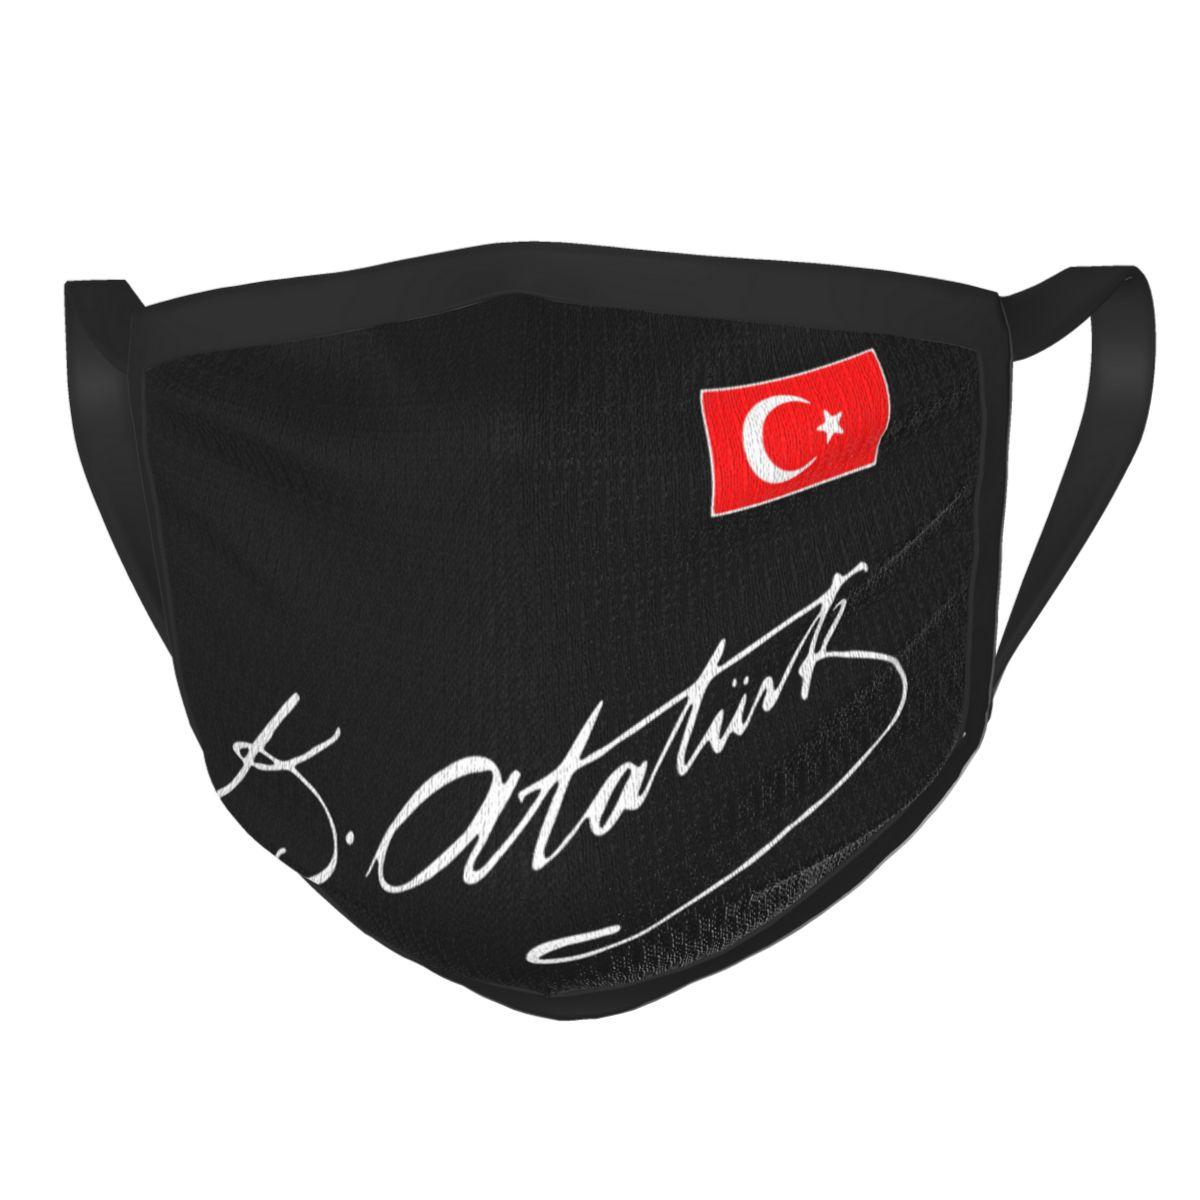 Ataturk turquia bandeira reutilizável máscara facial turco ataturk assinatura anti haze dustproof máscara proteção capa respirador muffle Máscaras dos homens    -